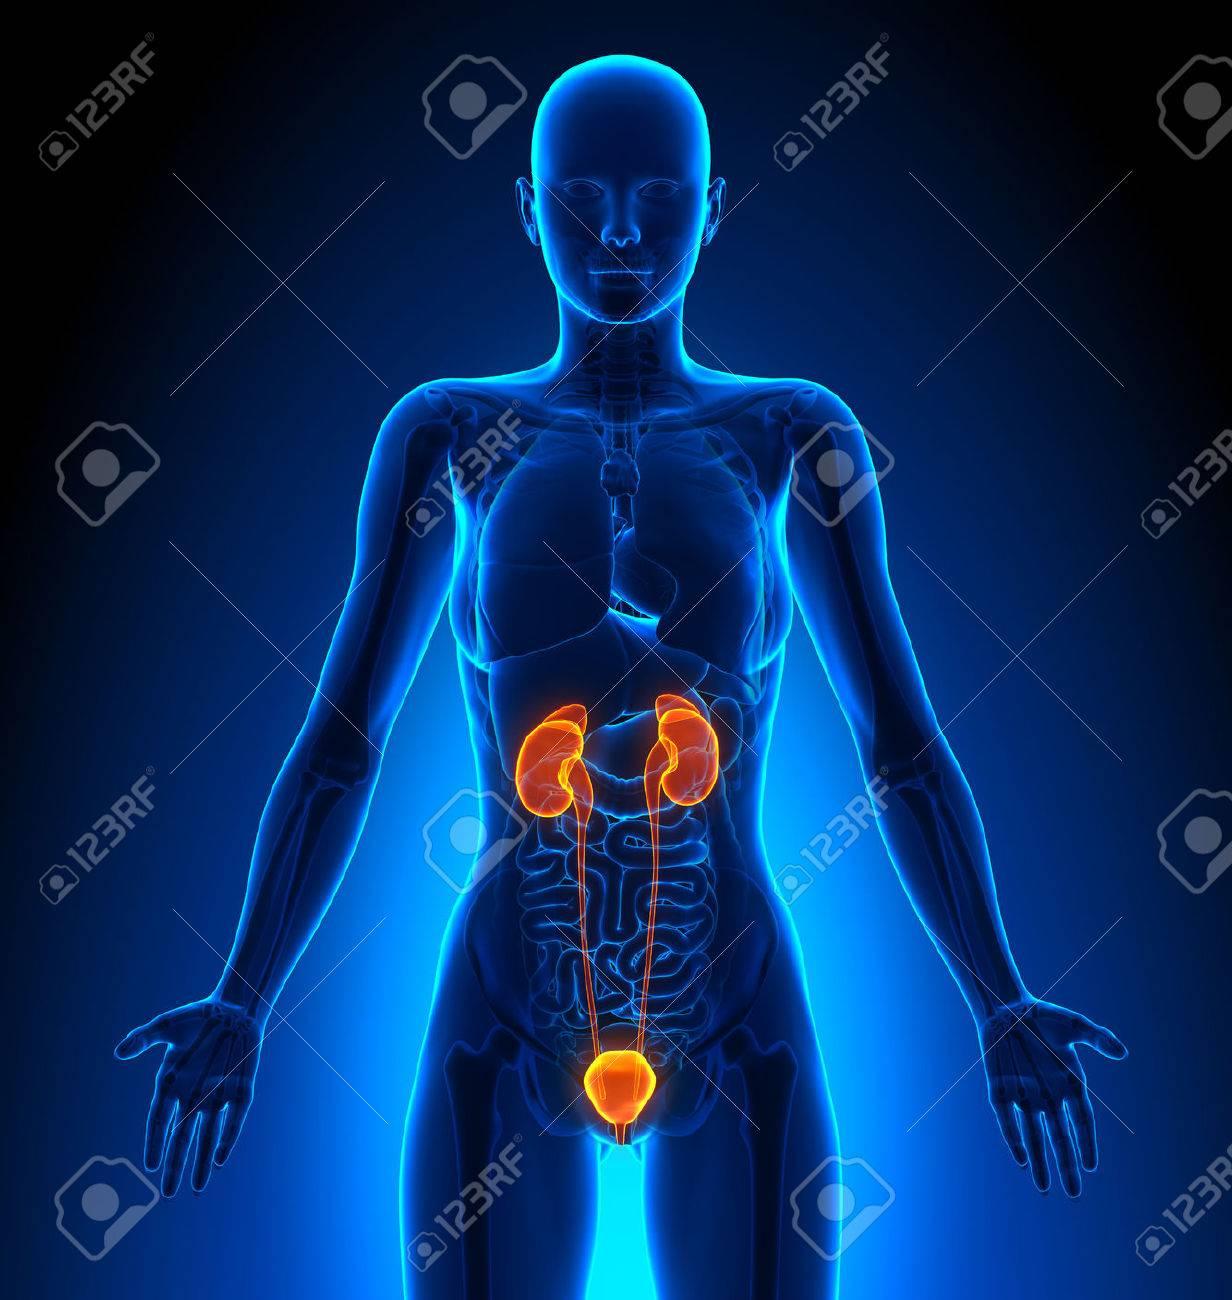 Sistema Urinario - Femenino Órganos - Anatomía Humana Fotos ...